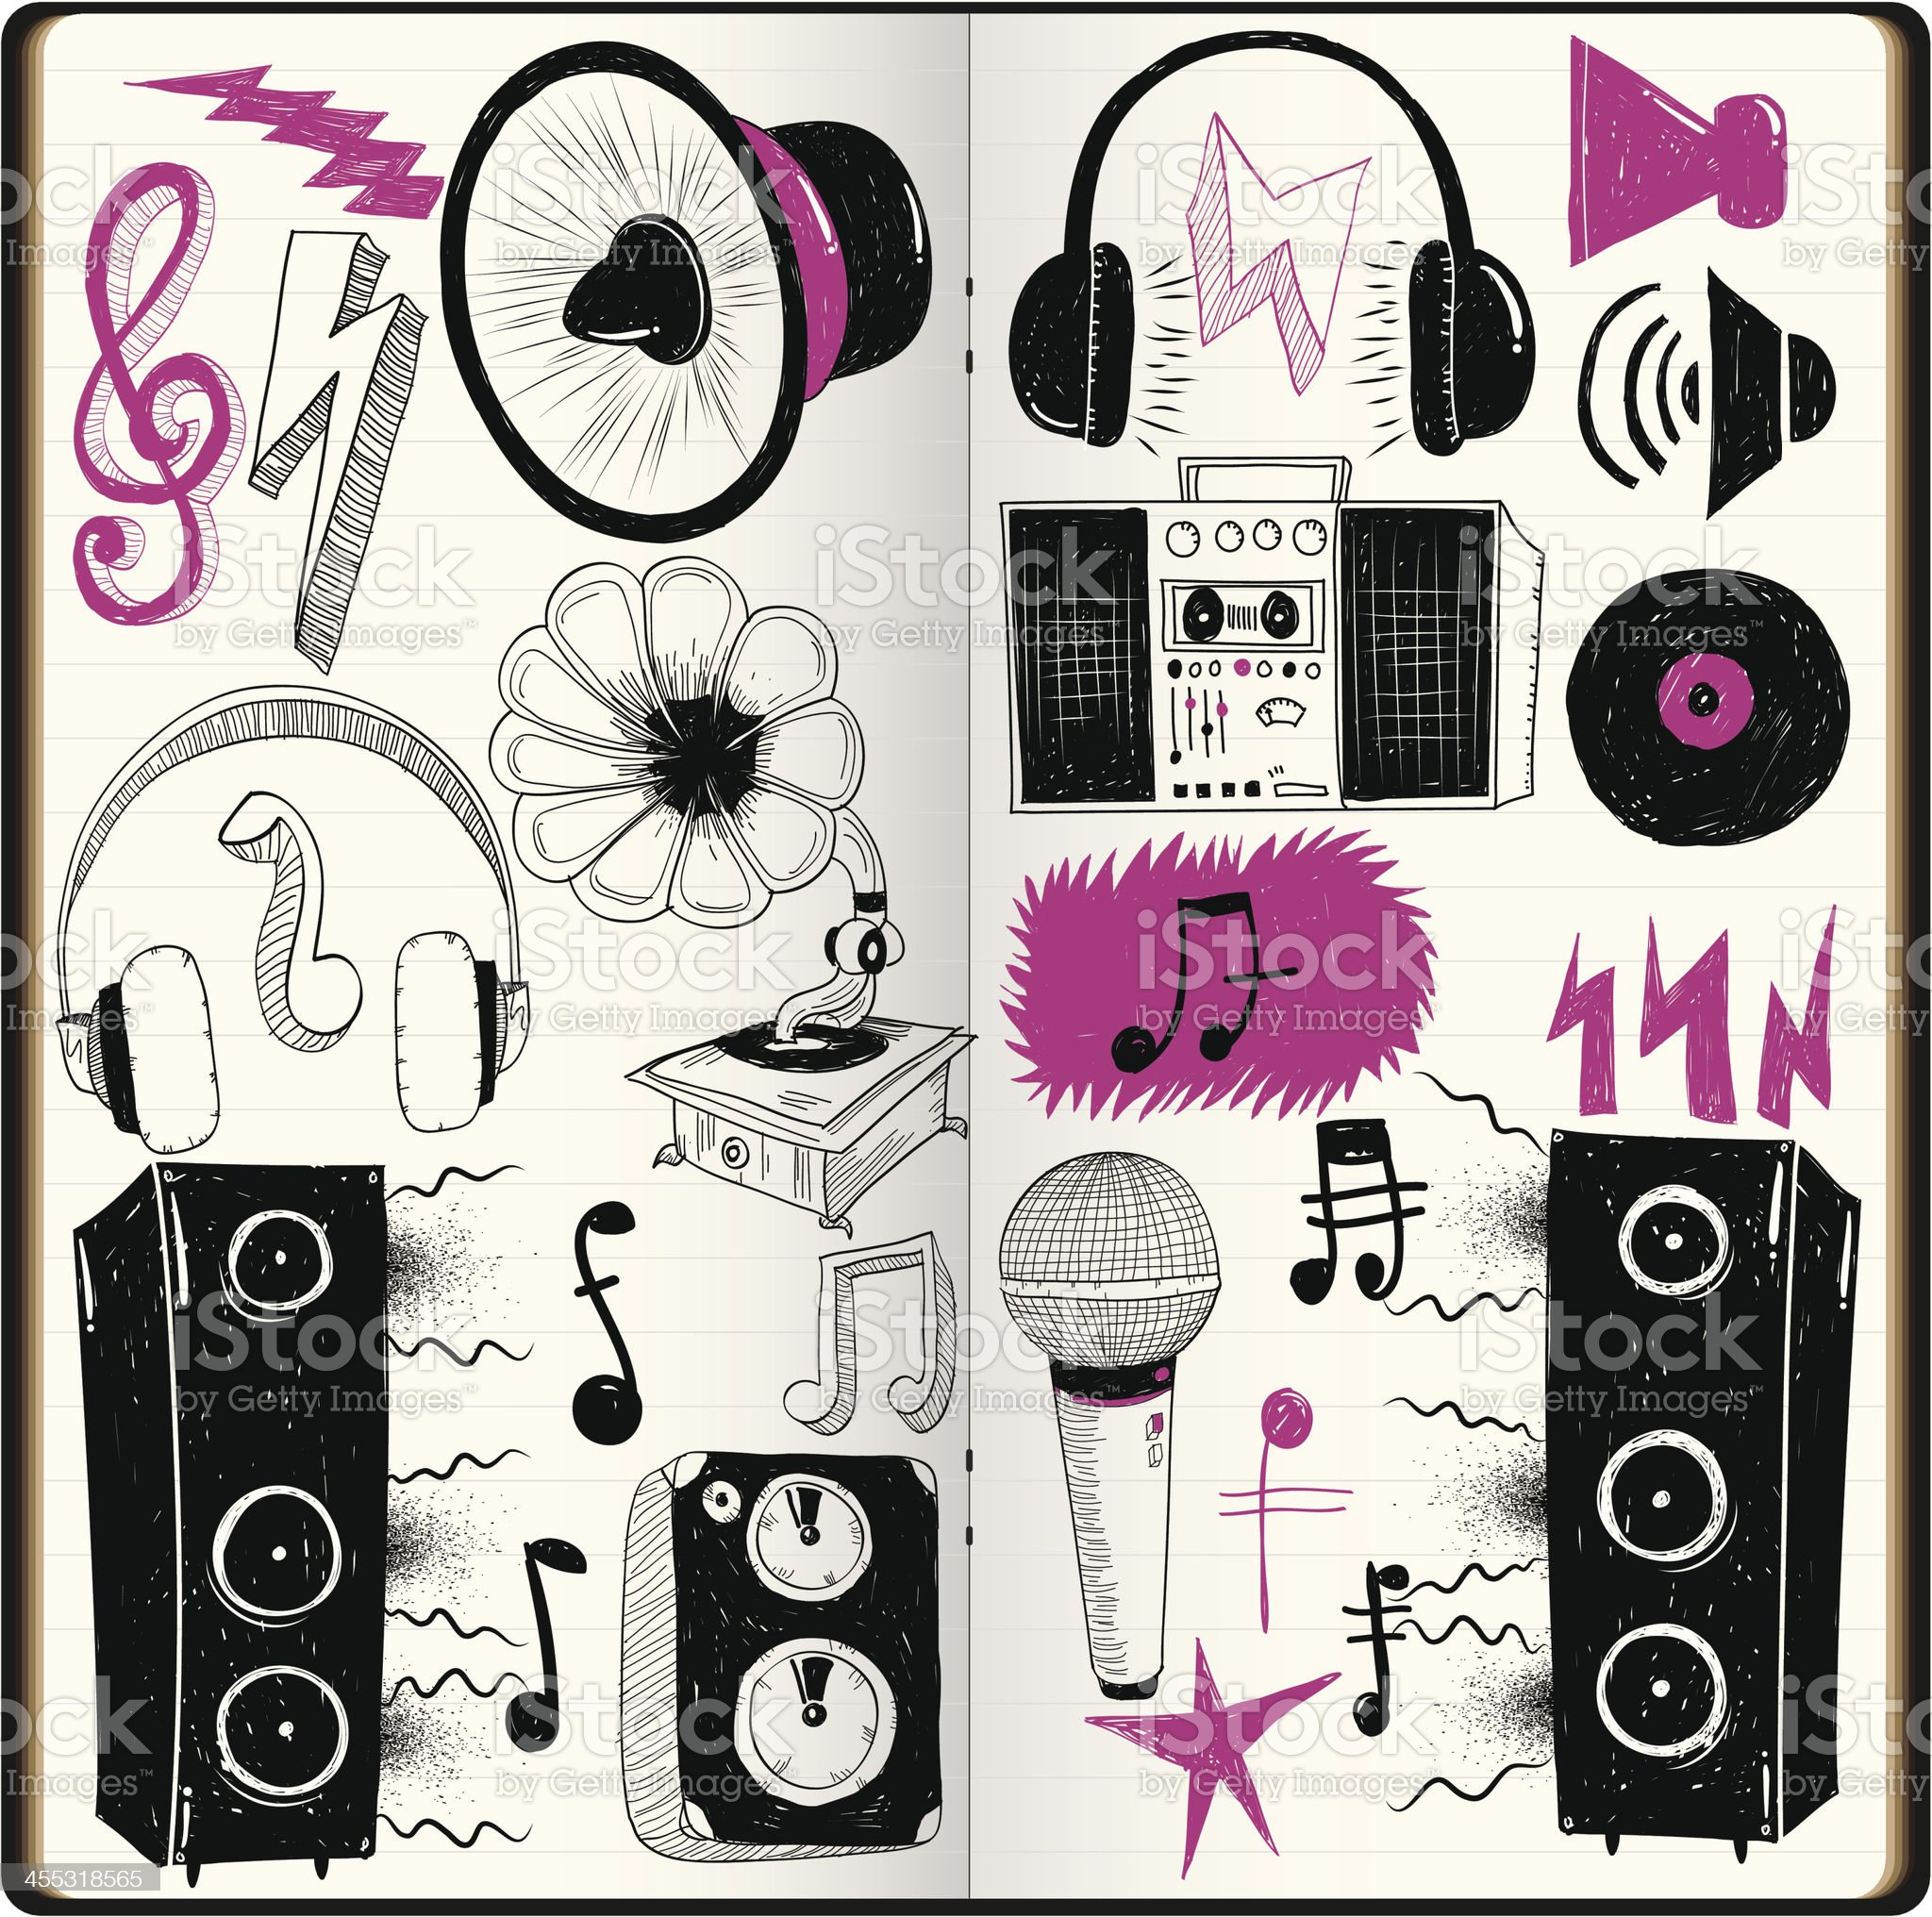 Loud Doodles royalty-free stock vector art